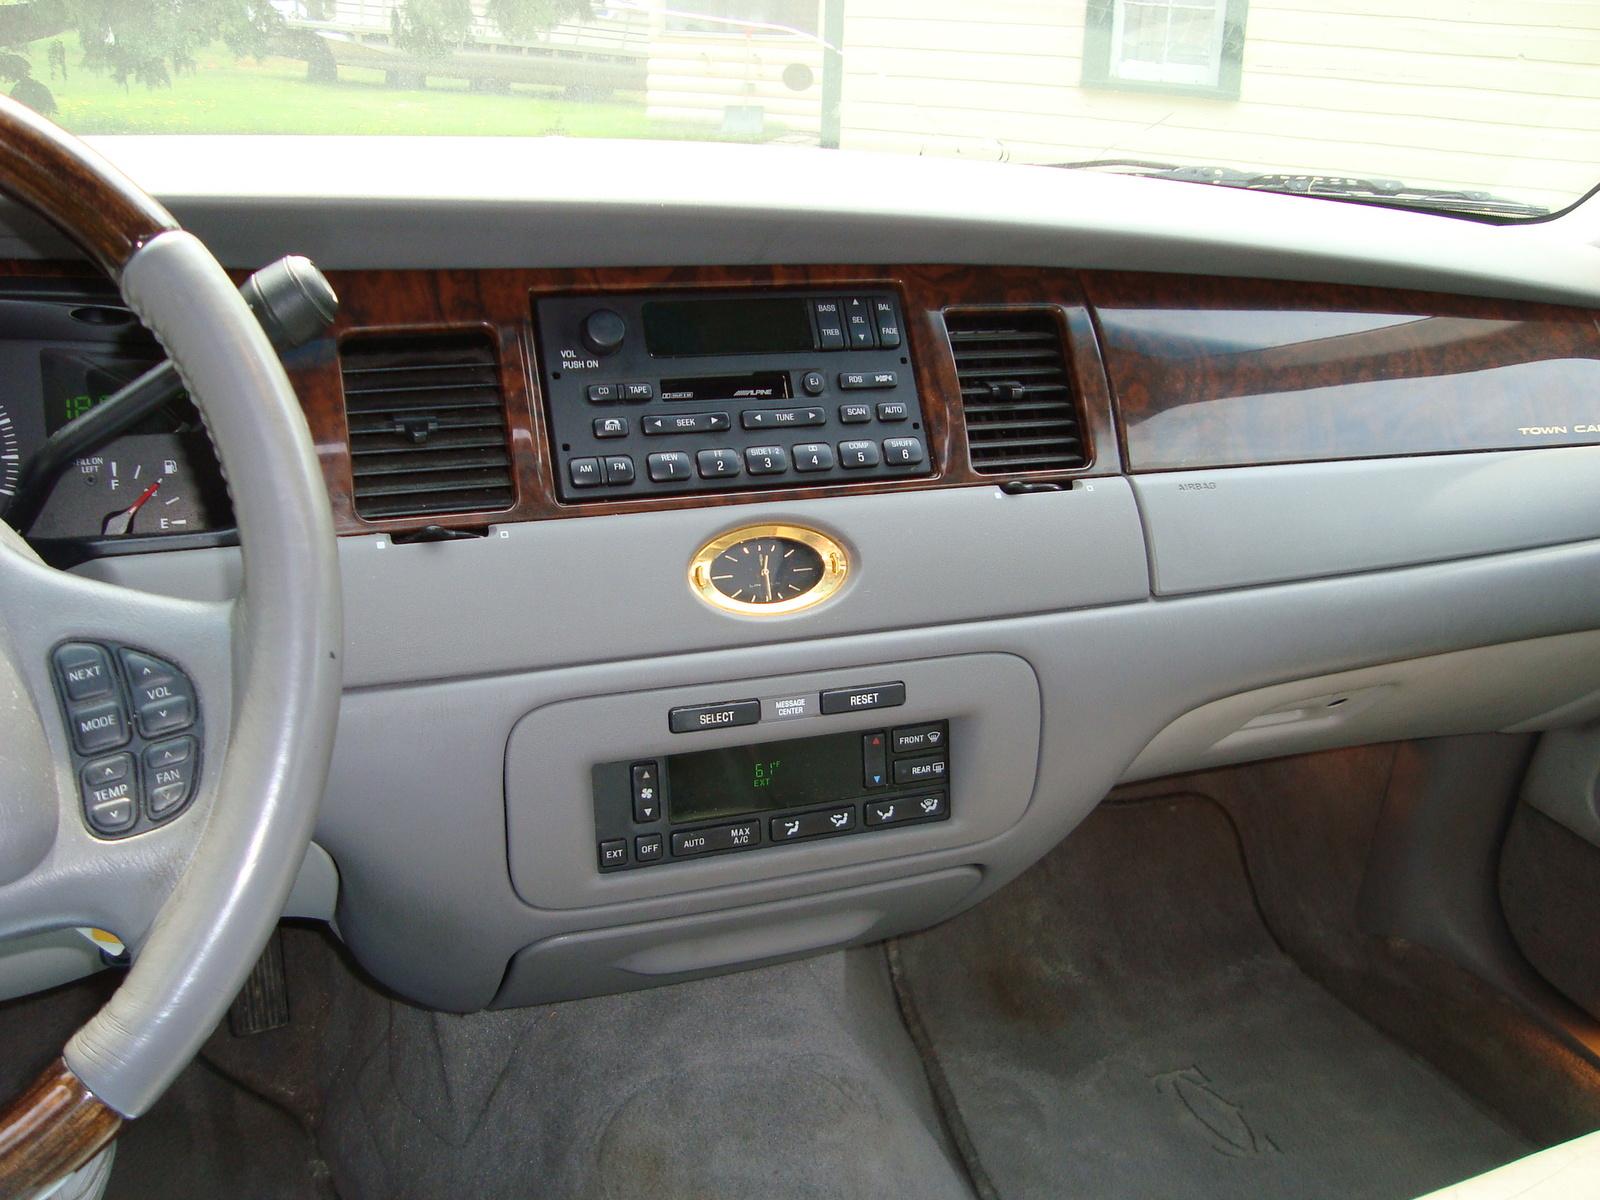 2000 Lincoln Town Car Interior Pictures Cargurus